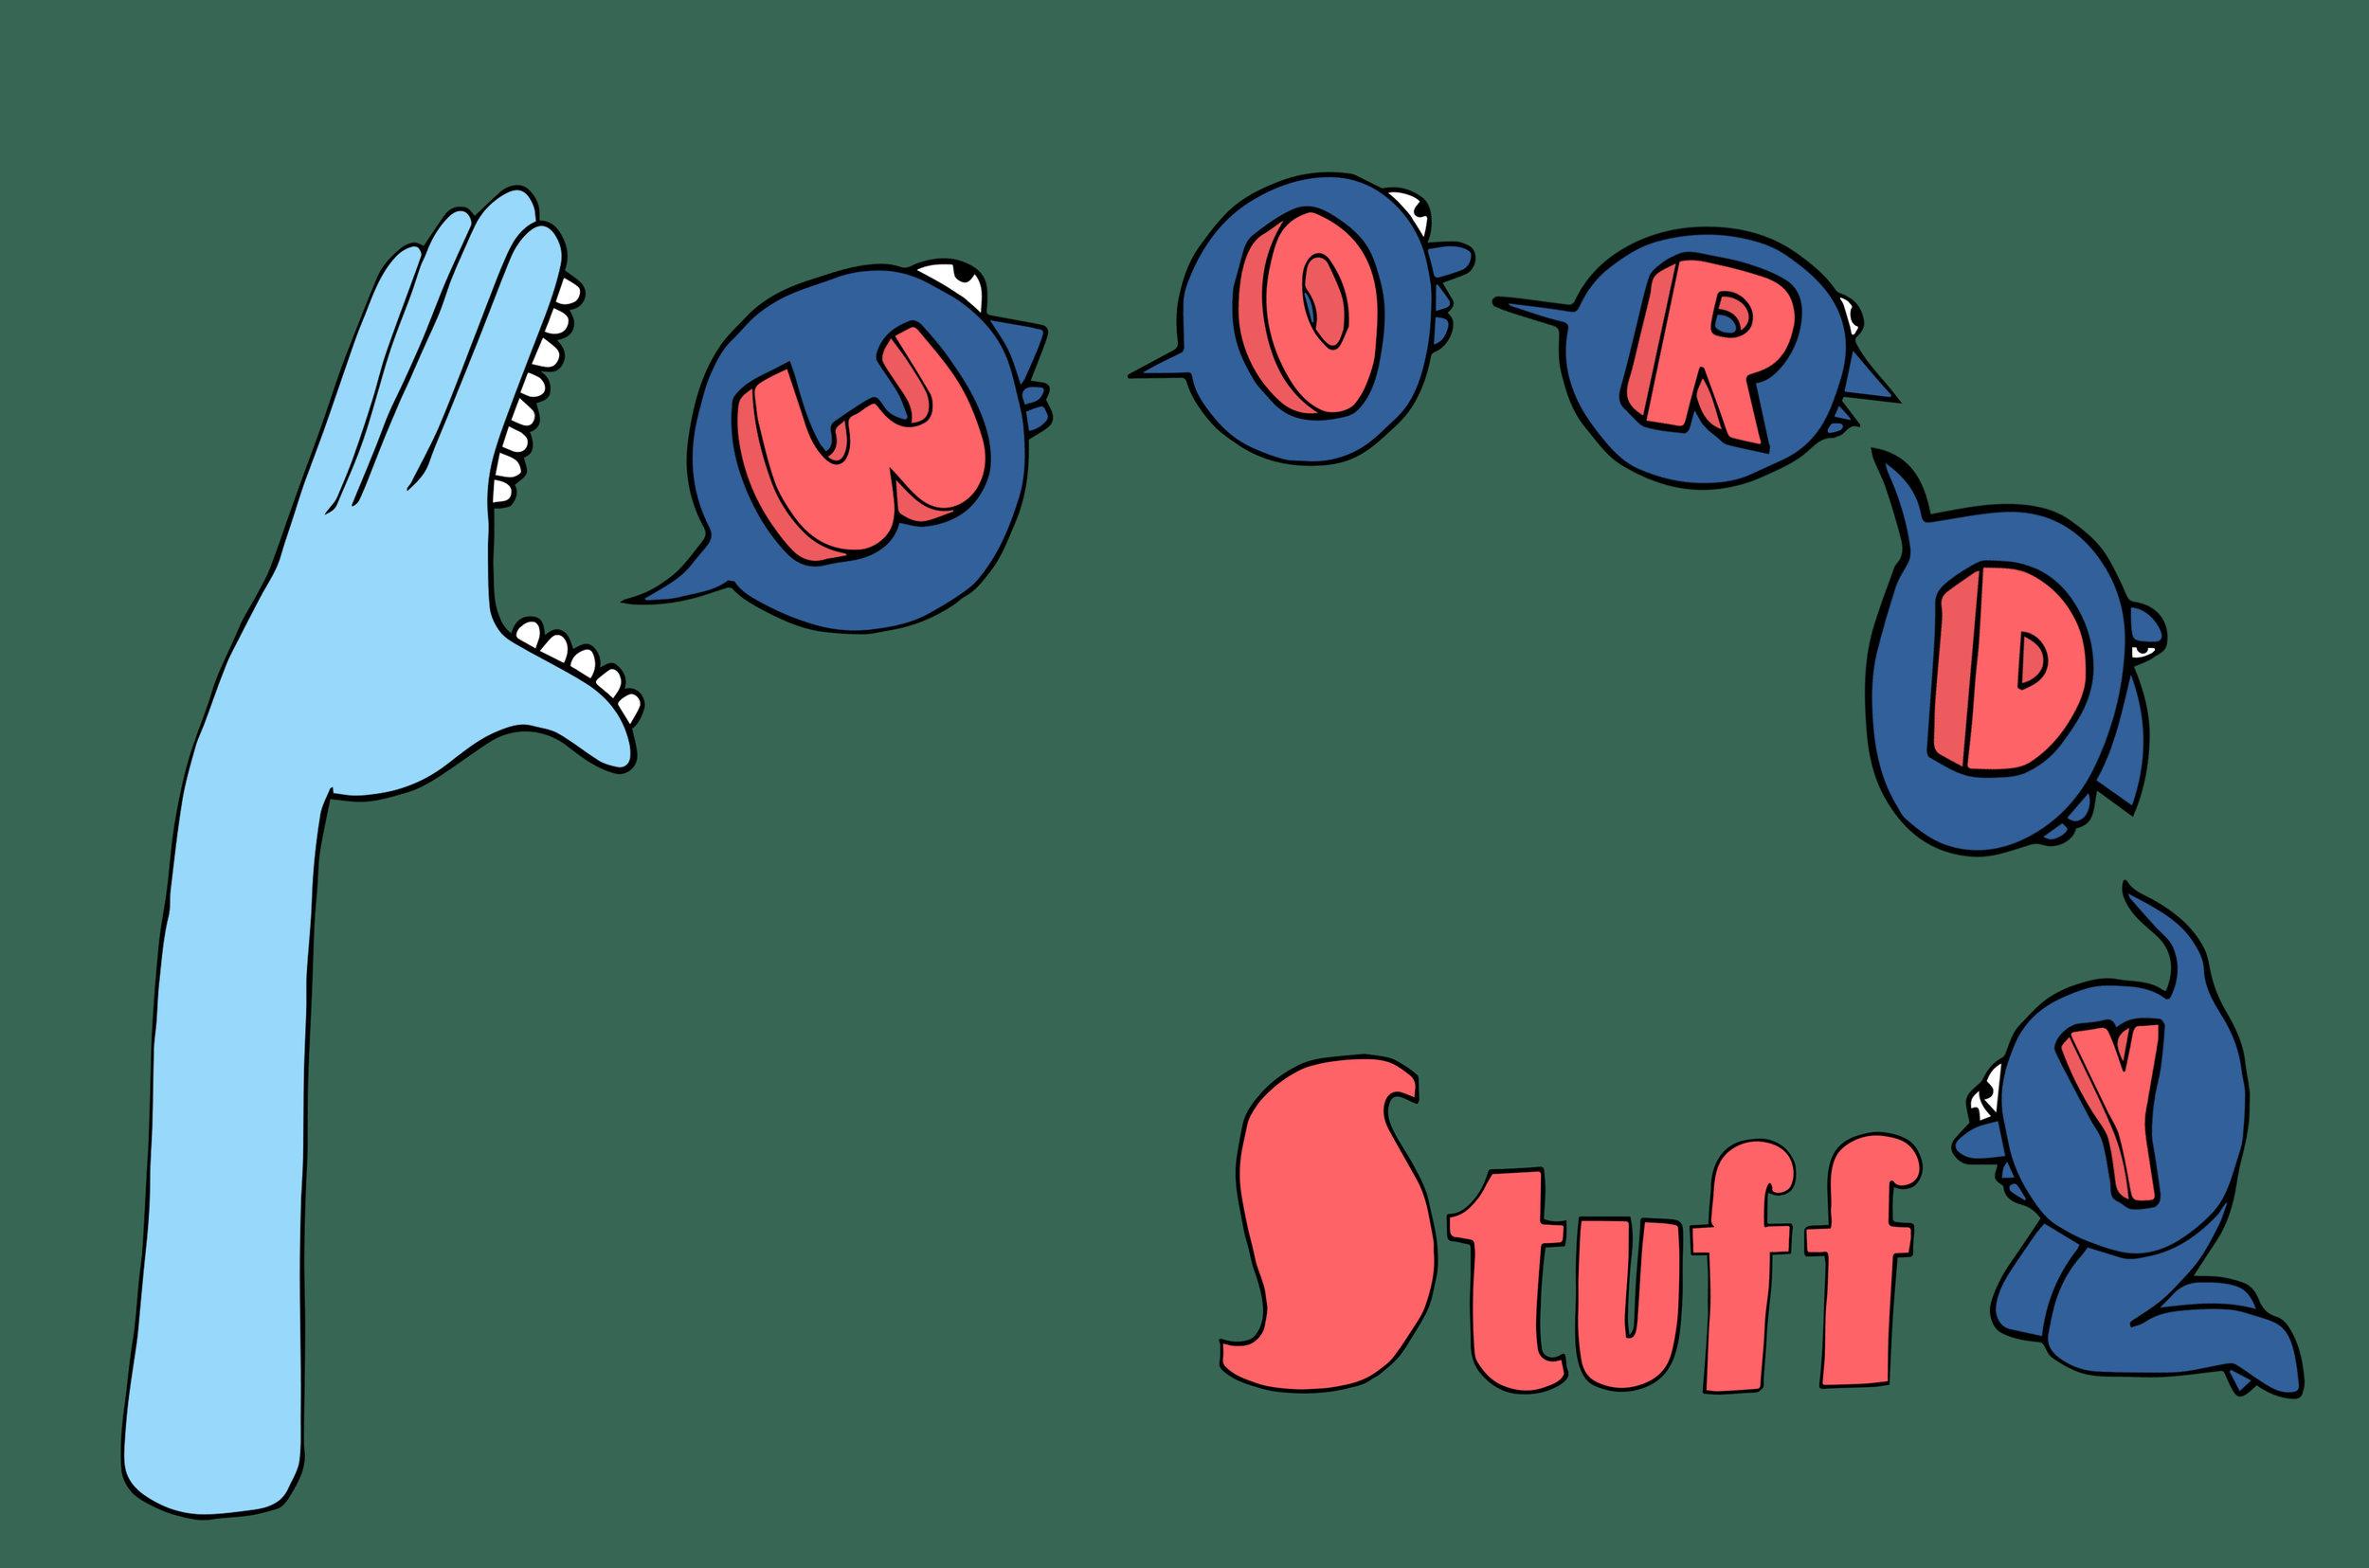 WordyStuff.jpg